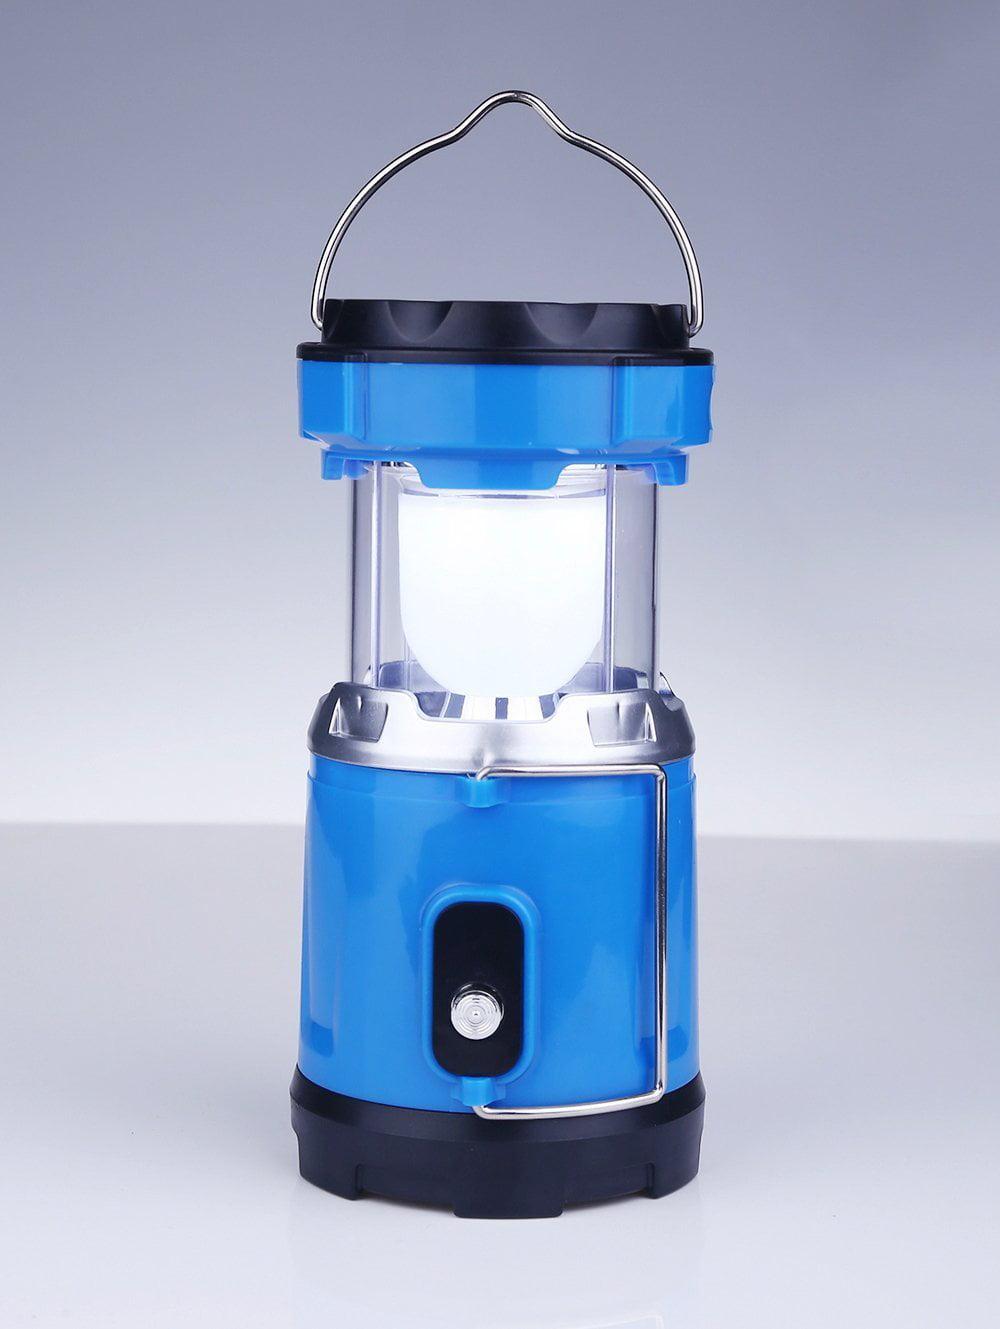 [2 Naissance]1 PCS Packed LED Camping Lantern Flashlights -Home Improvement,Hurricane Emergency Tent Light Backpacking,Hiking,Fishing&... by